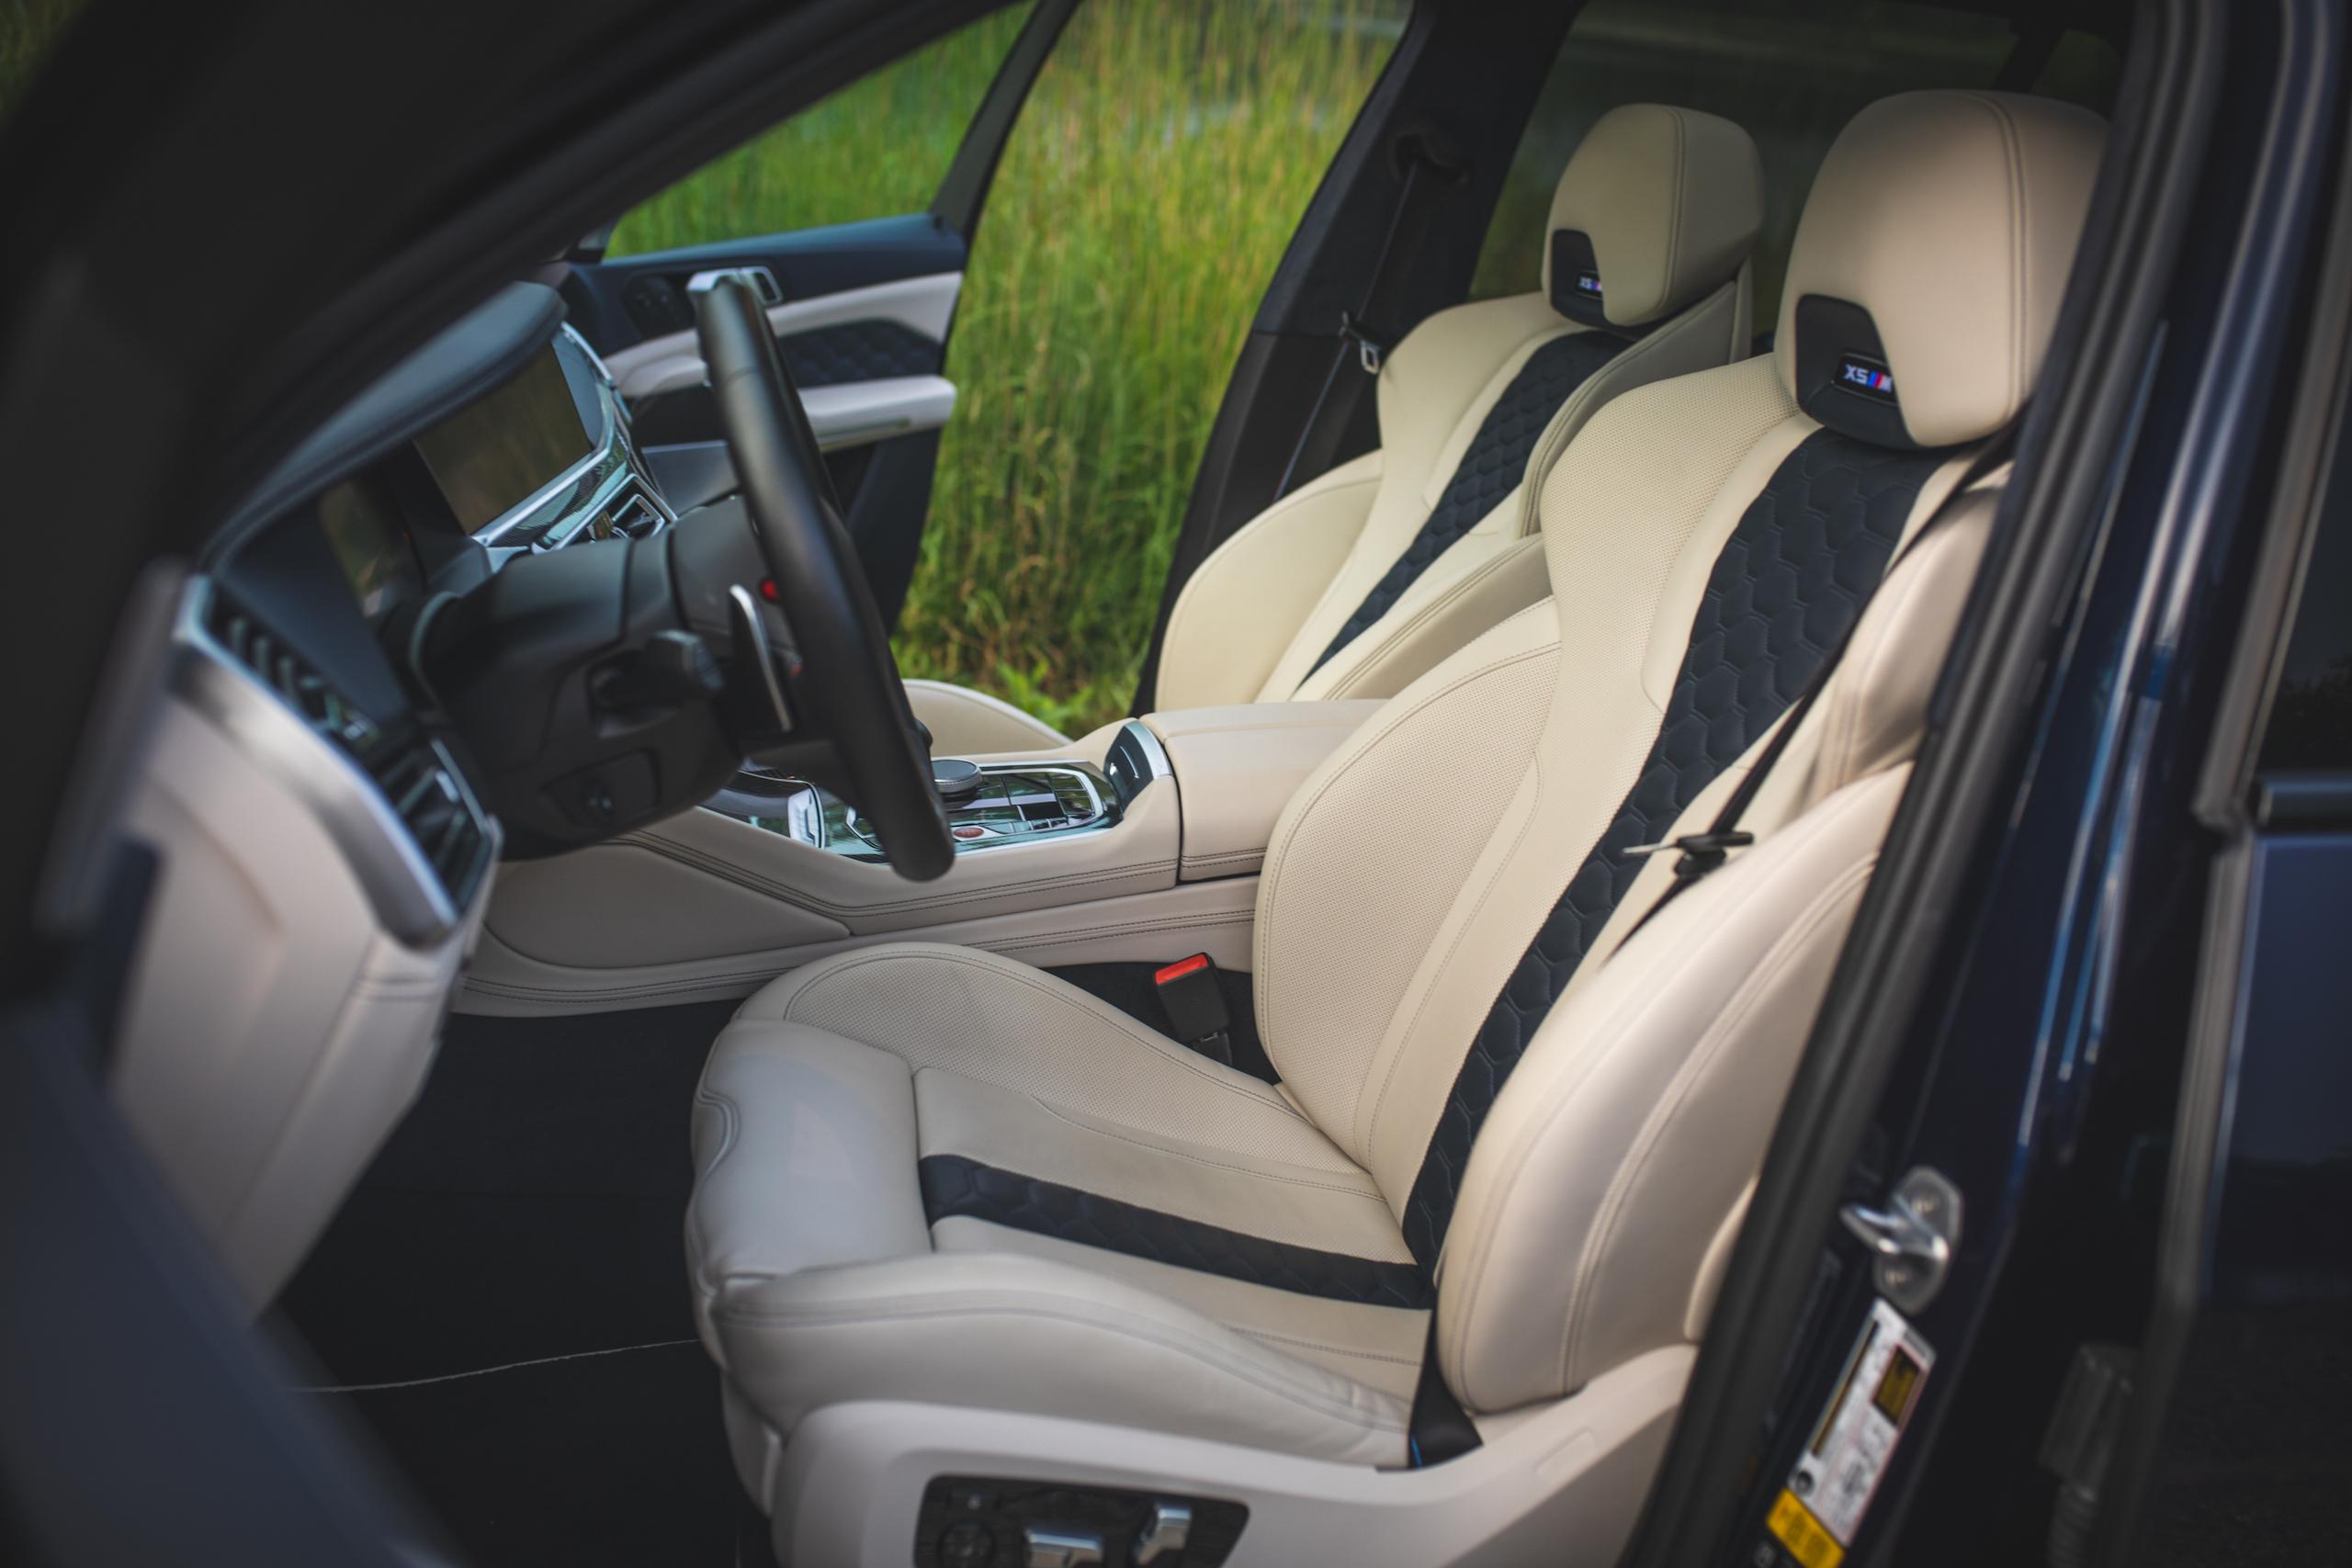 bmw x5m interior front seats